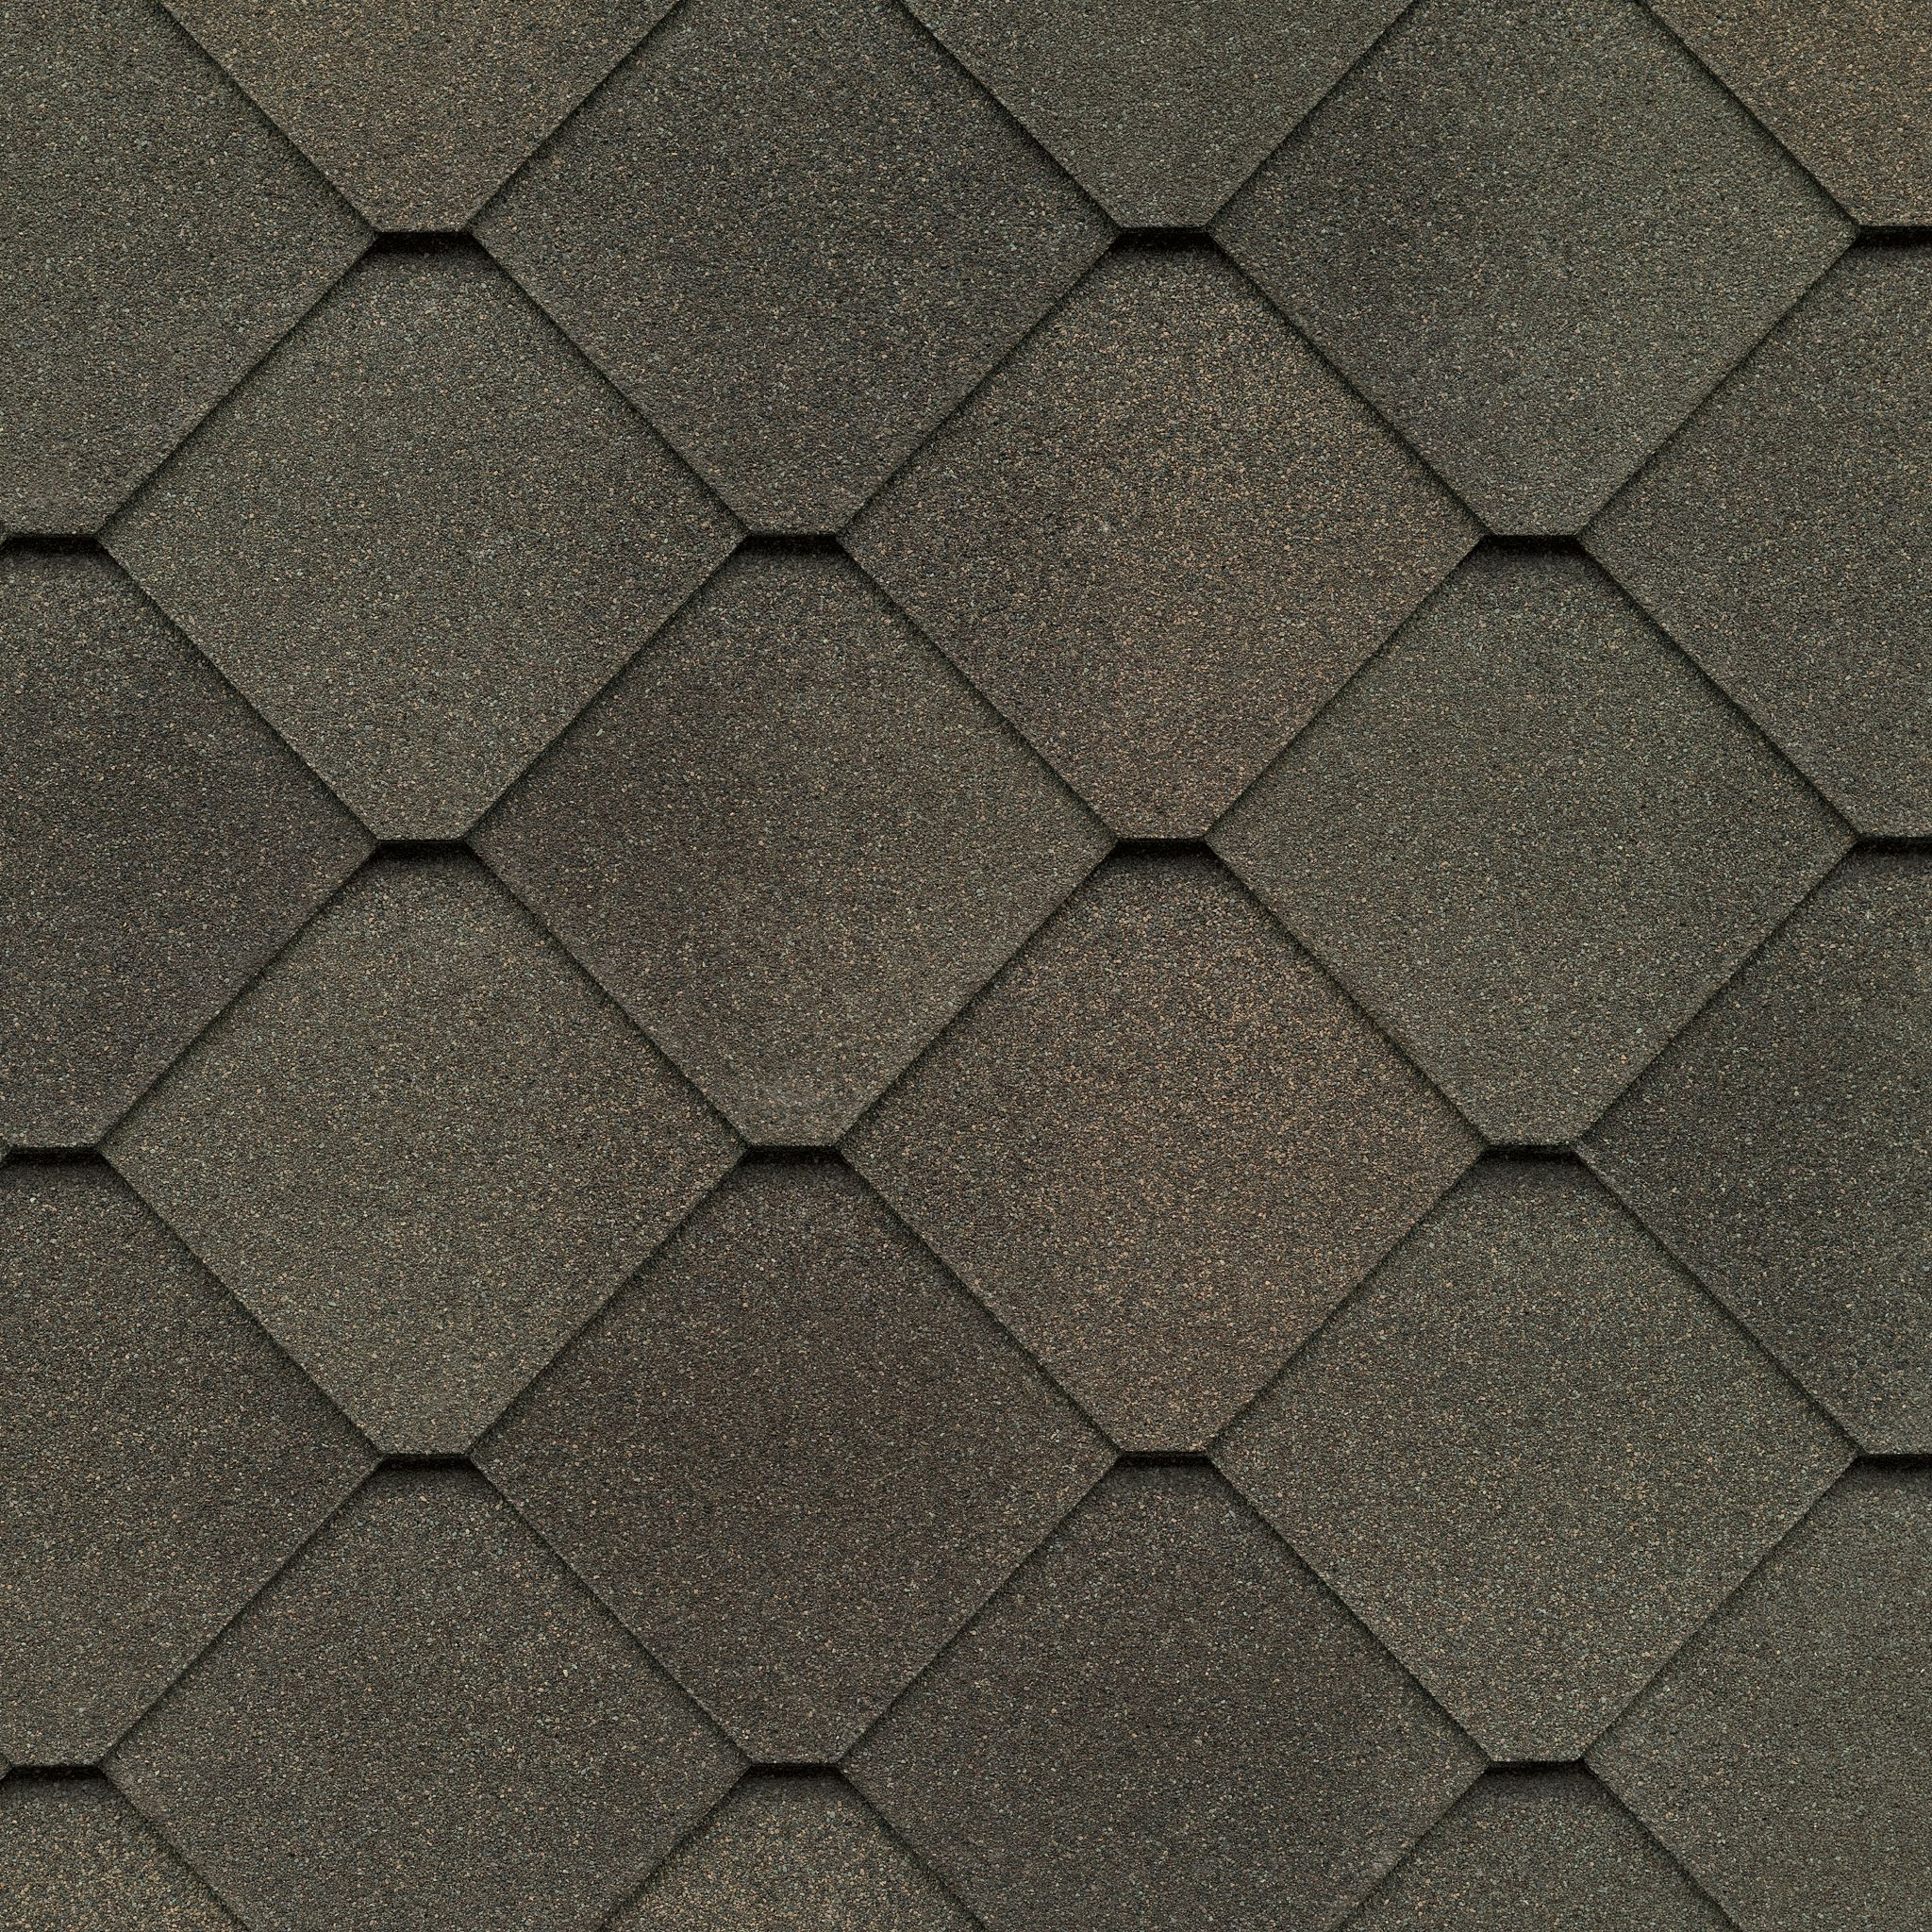 Sienna Aged Oak Gaf Architectural Shingles Roof Roof Shingles Roof Architecture